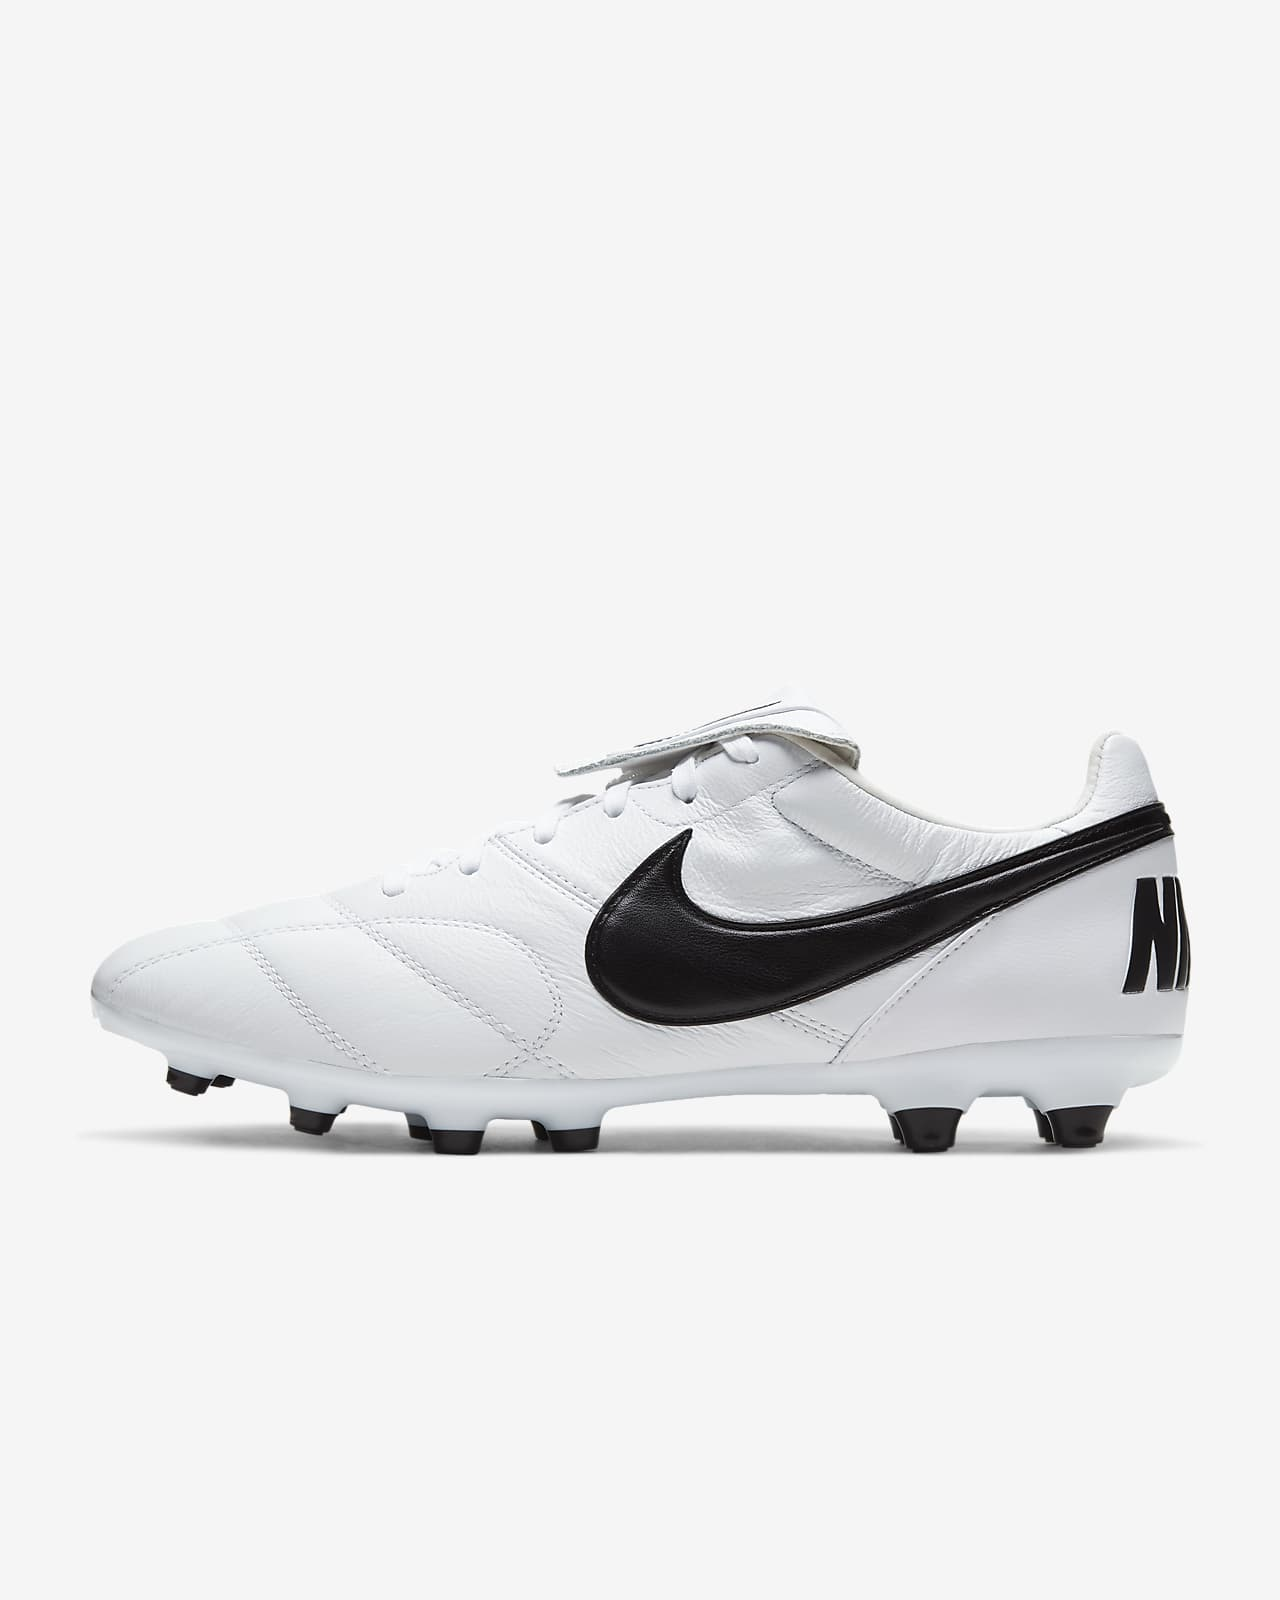 Sonrisa paralelo Rizo  Nike Premier II FG Firm-Ground Football Boot. Nike GB